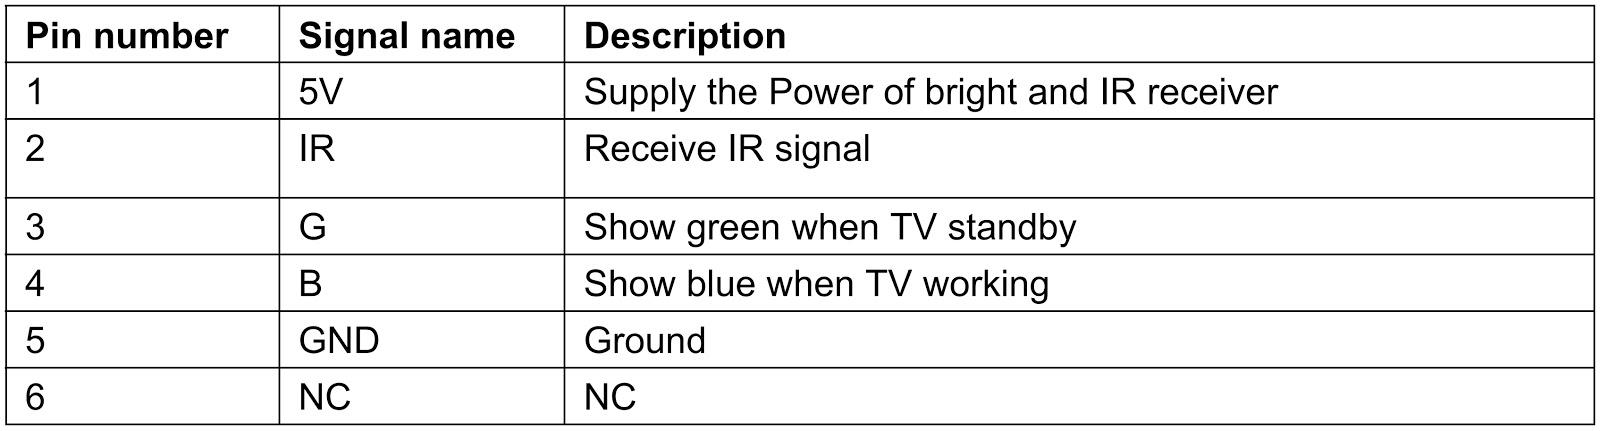 haier l40r1 flat panel tv circuit boards details \u0026 connector pinir connector (cne1)